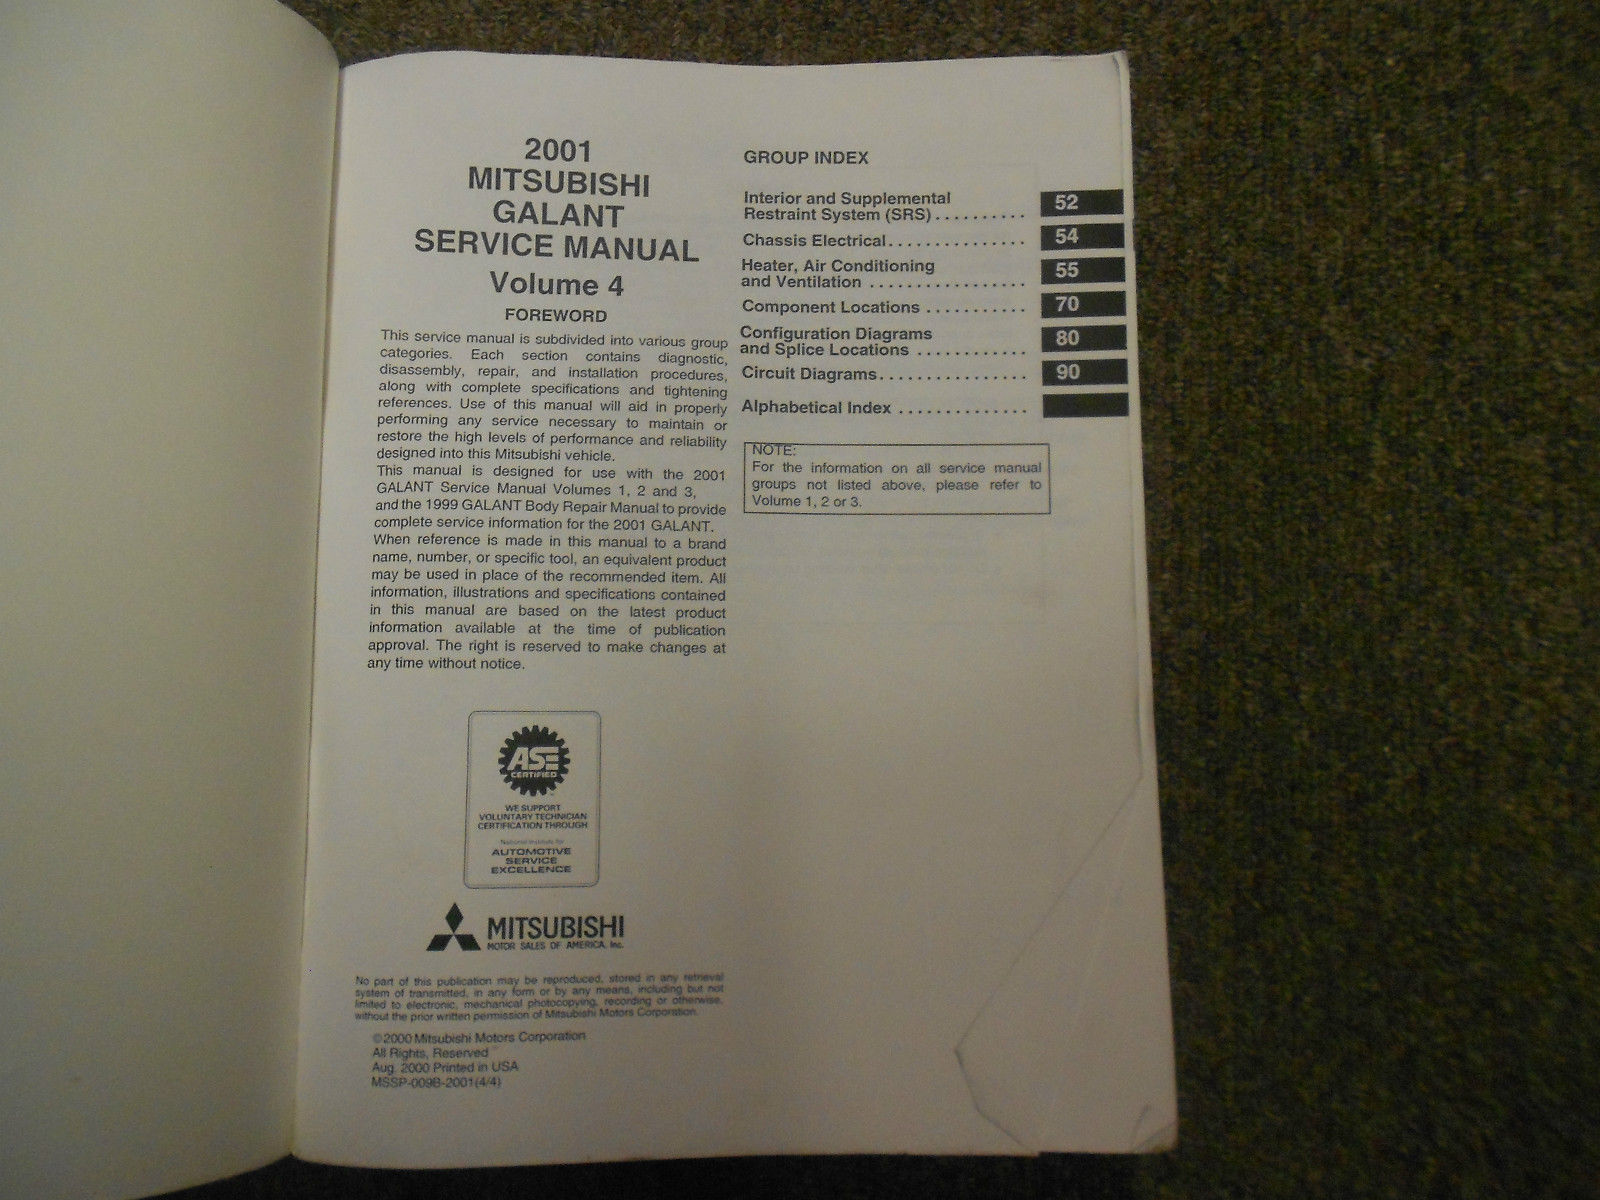 2001 MITSUBISHI Galant Service Repair Shop Manual FACTORY OEM SET BOOK x 4 VOL image 5